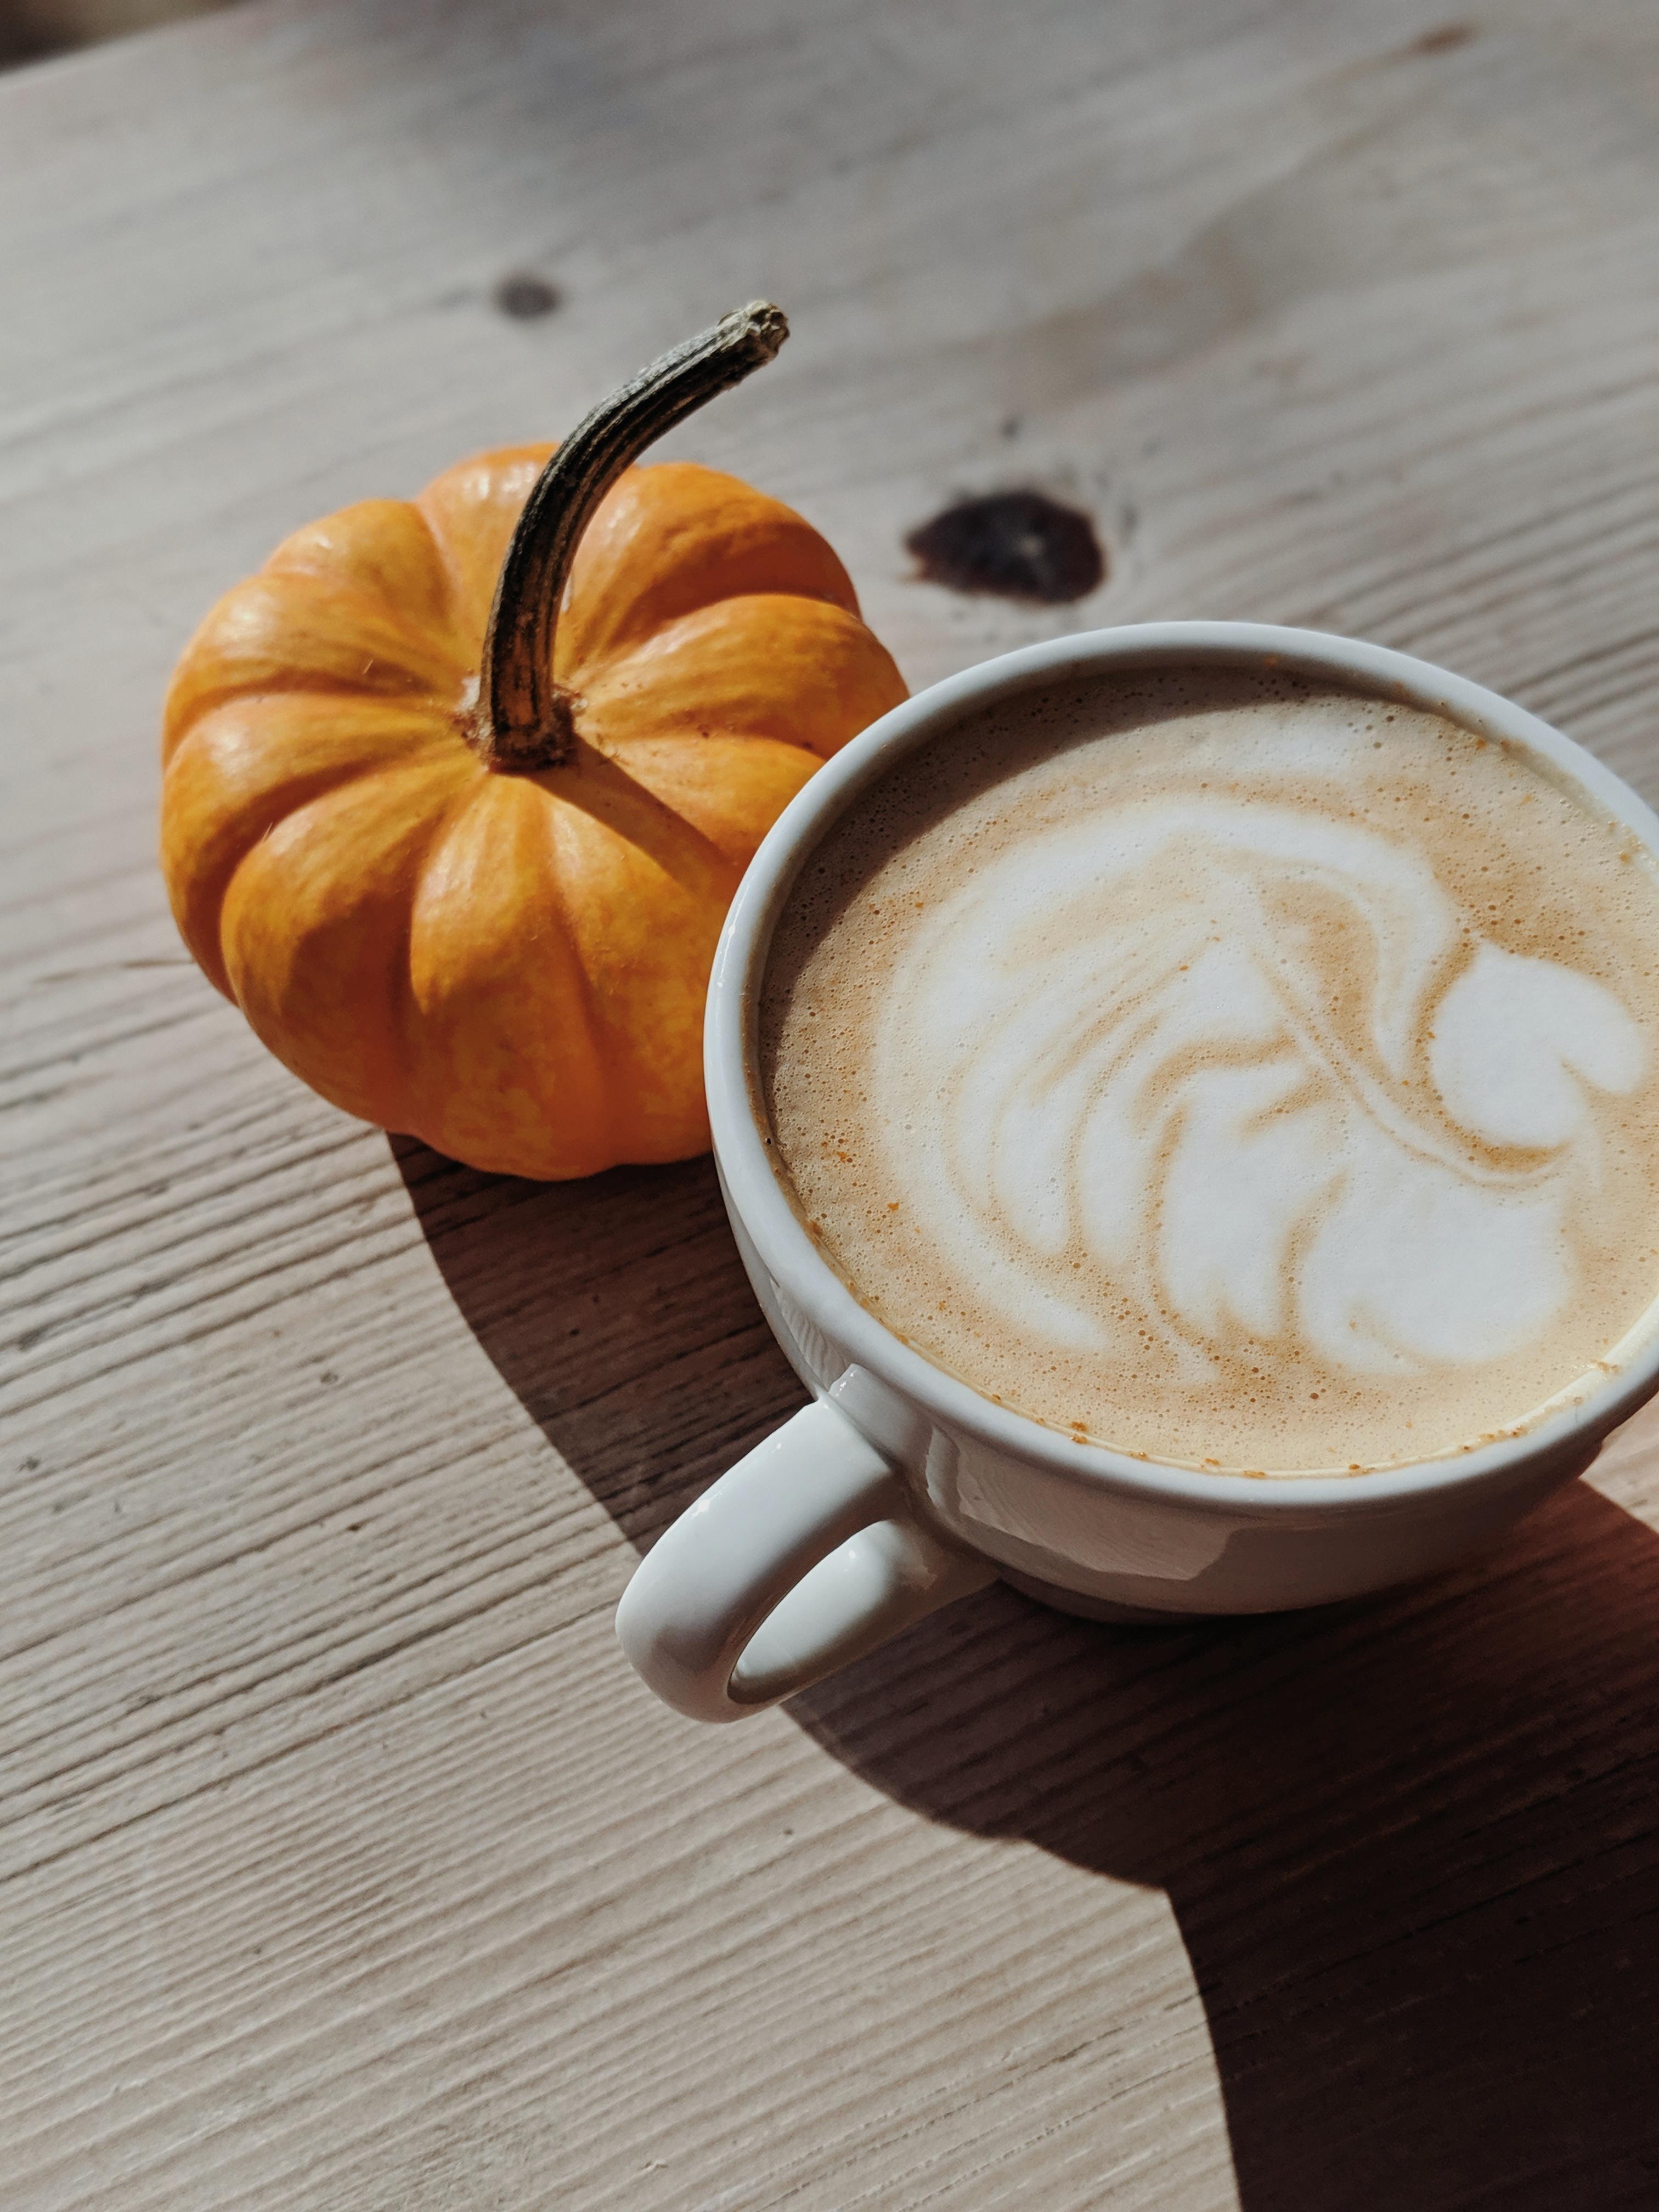 Mug of Cafe Latte